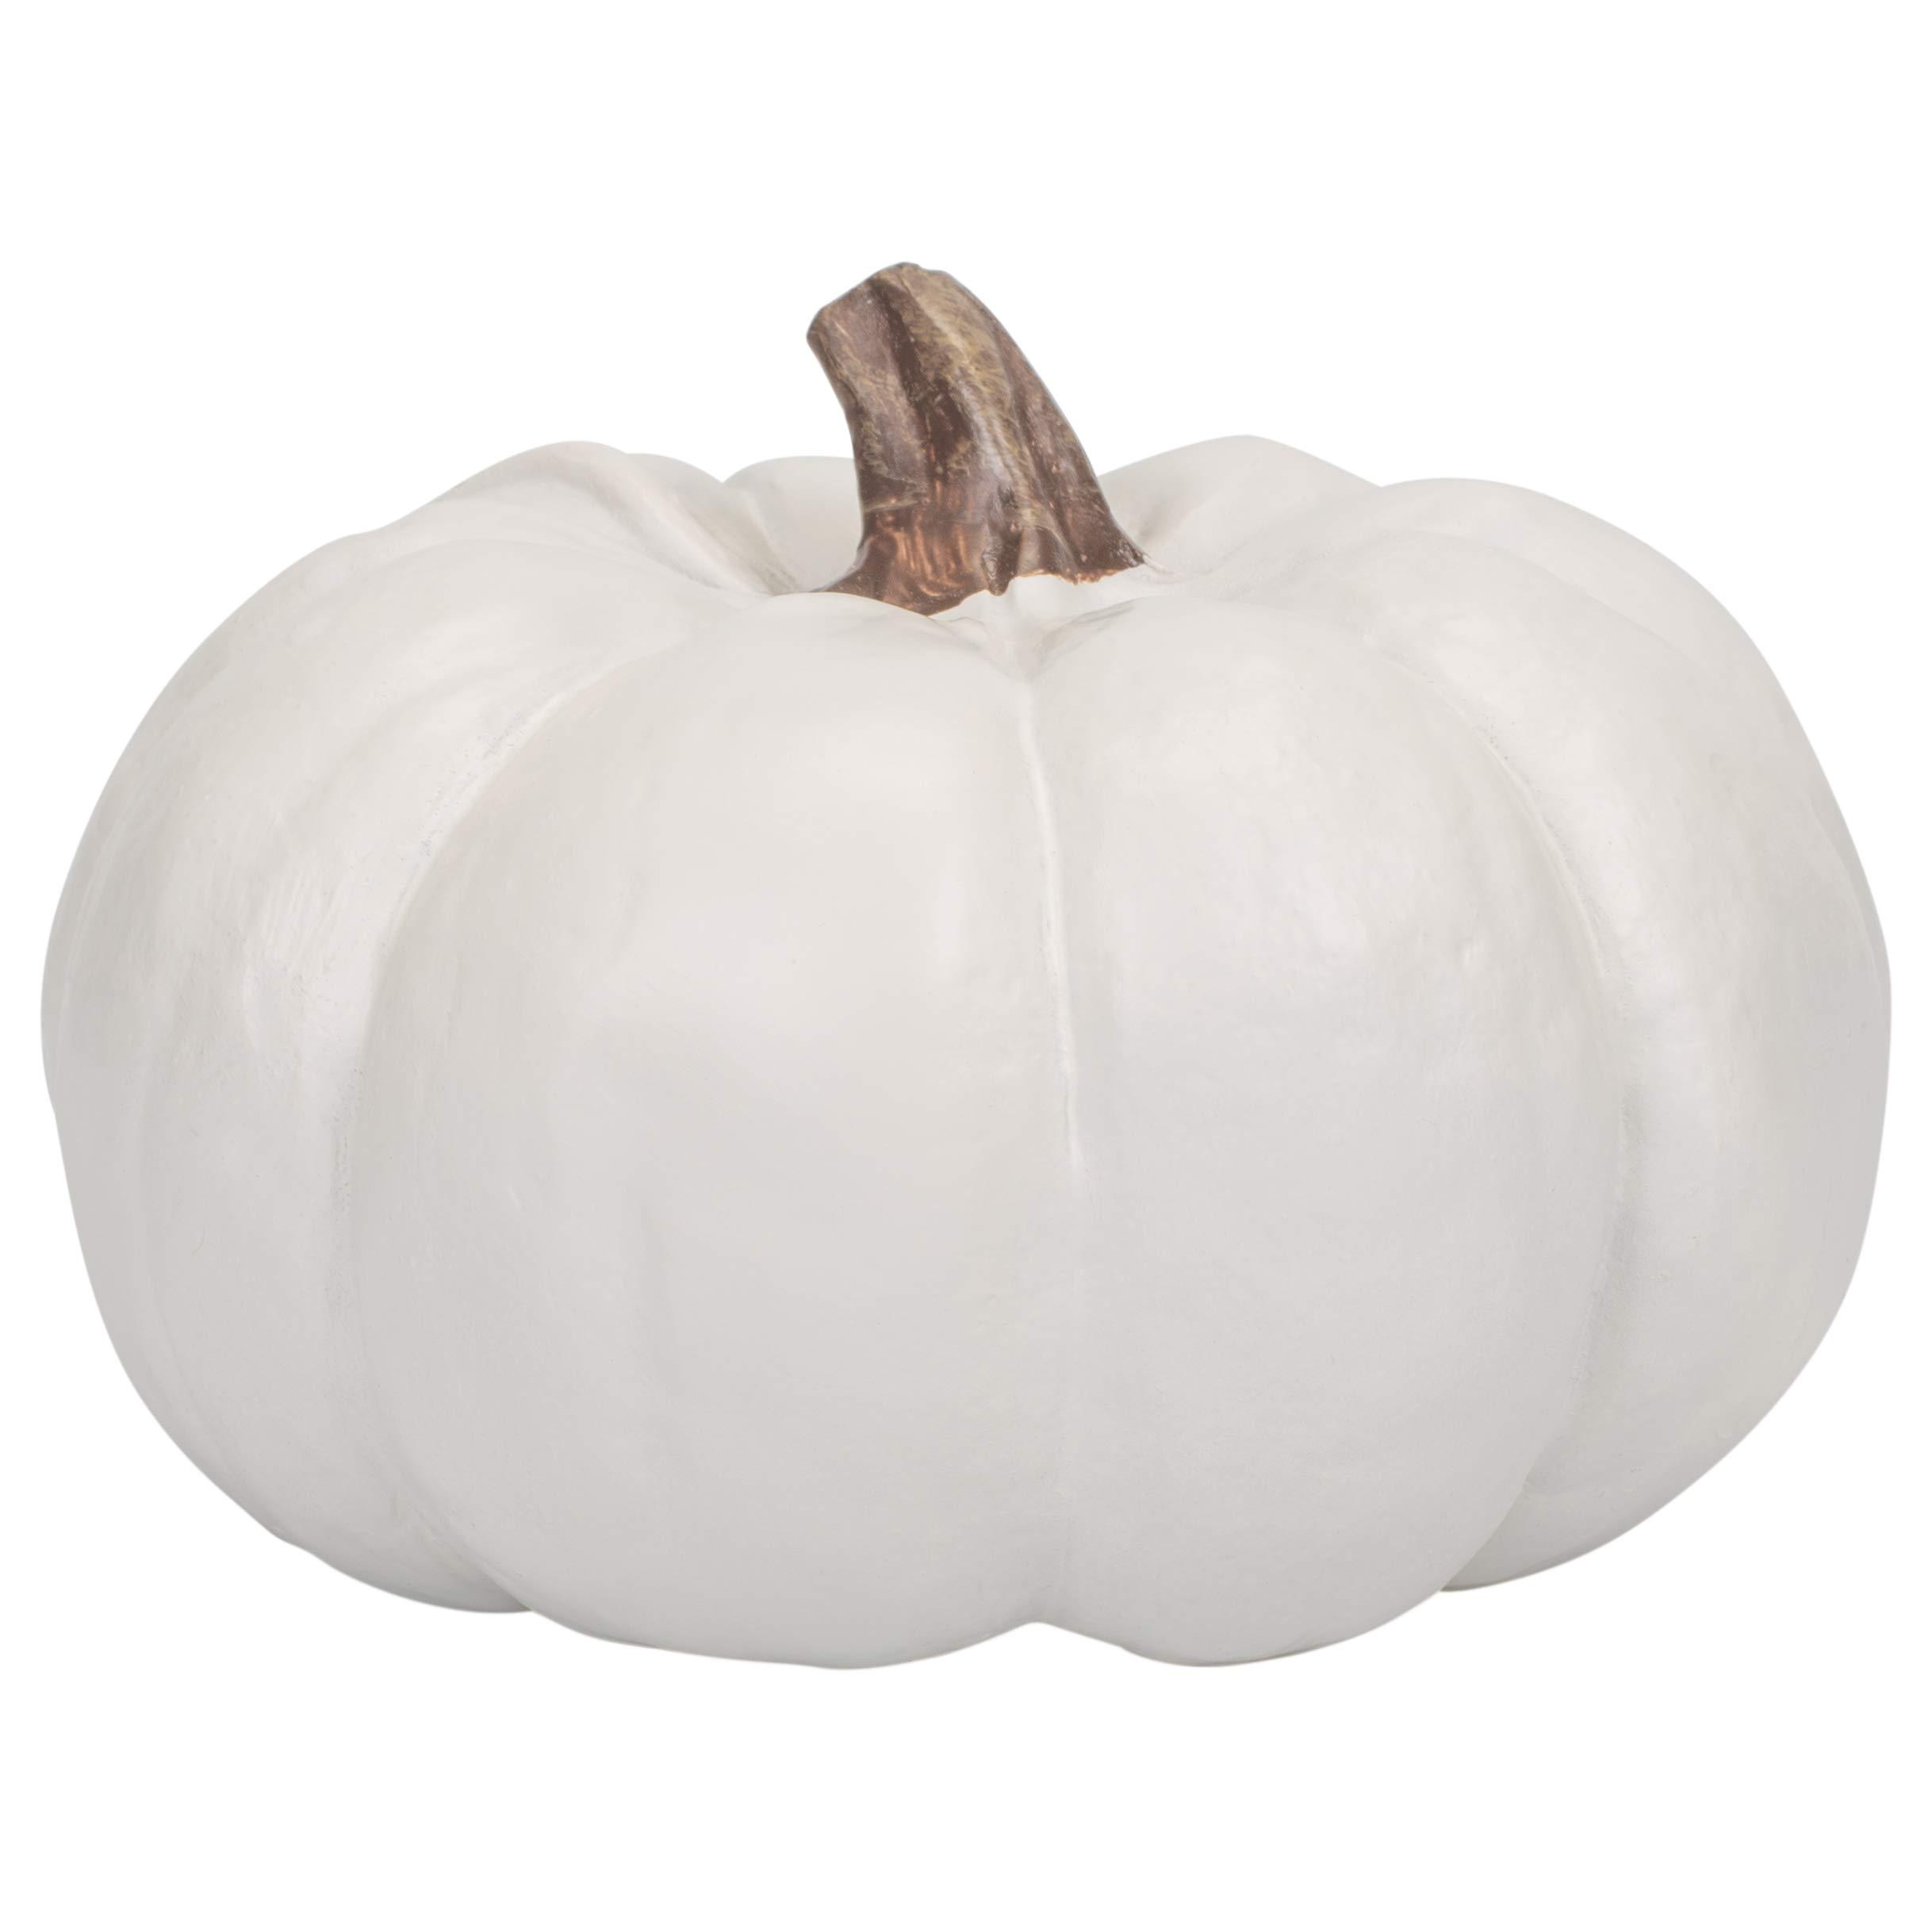 Elanze Designs Ivory 6 inch Decorative Resin Harvest Pumpkins (White), Quantity 1